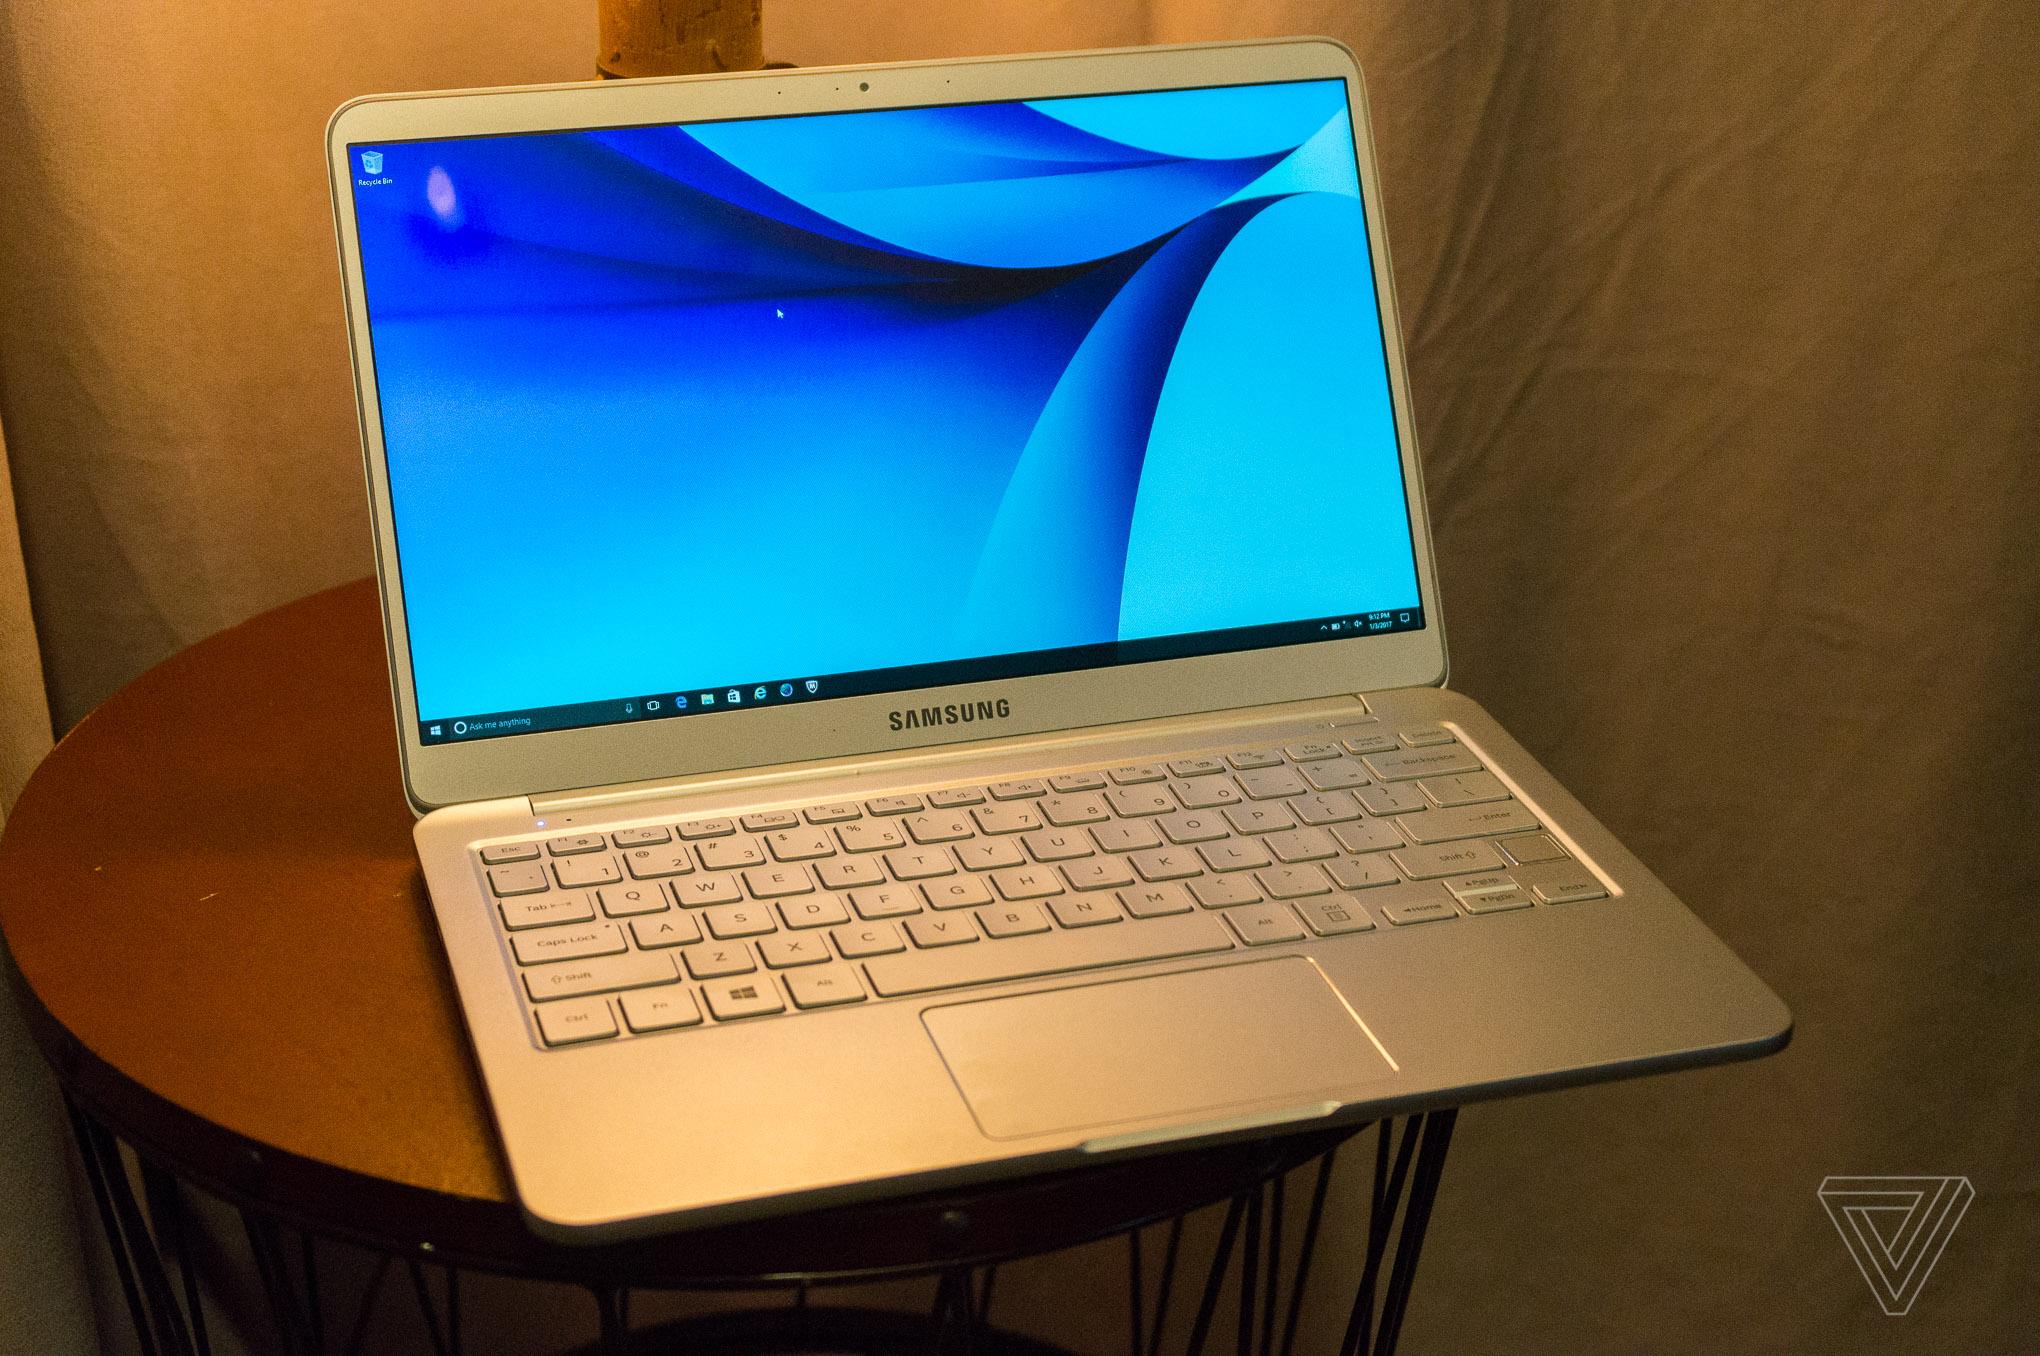 Notebook samsung 9 - Samsung Notebook 9 Vlad Savov